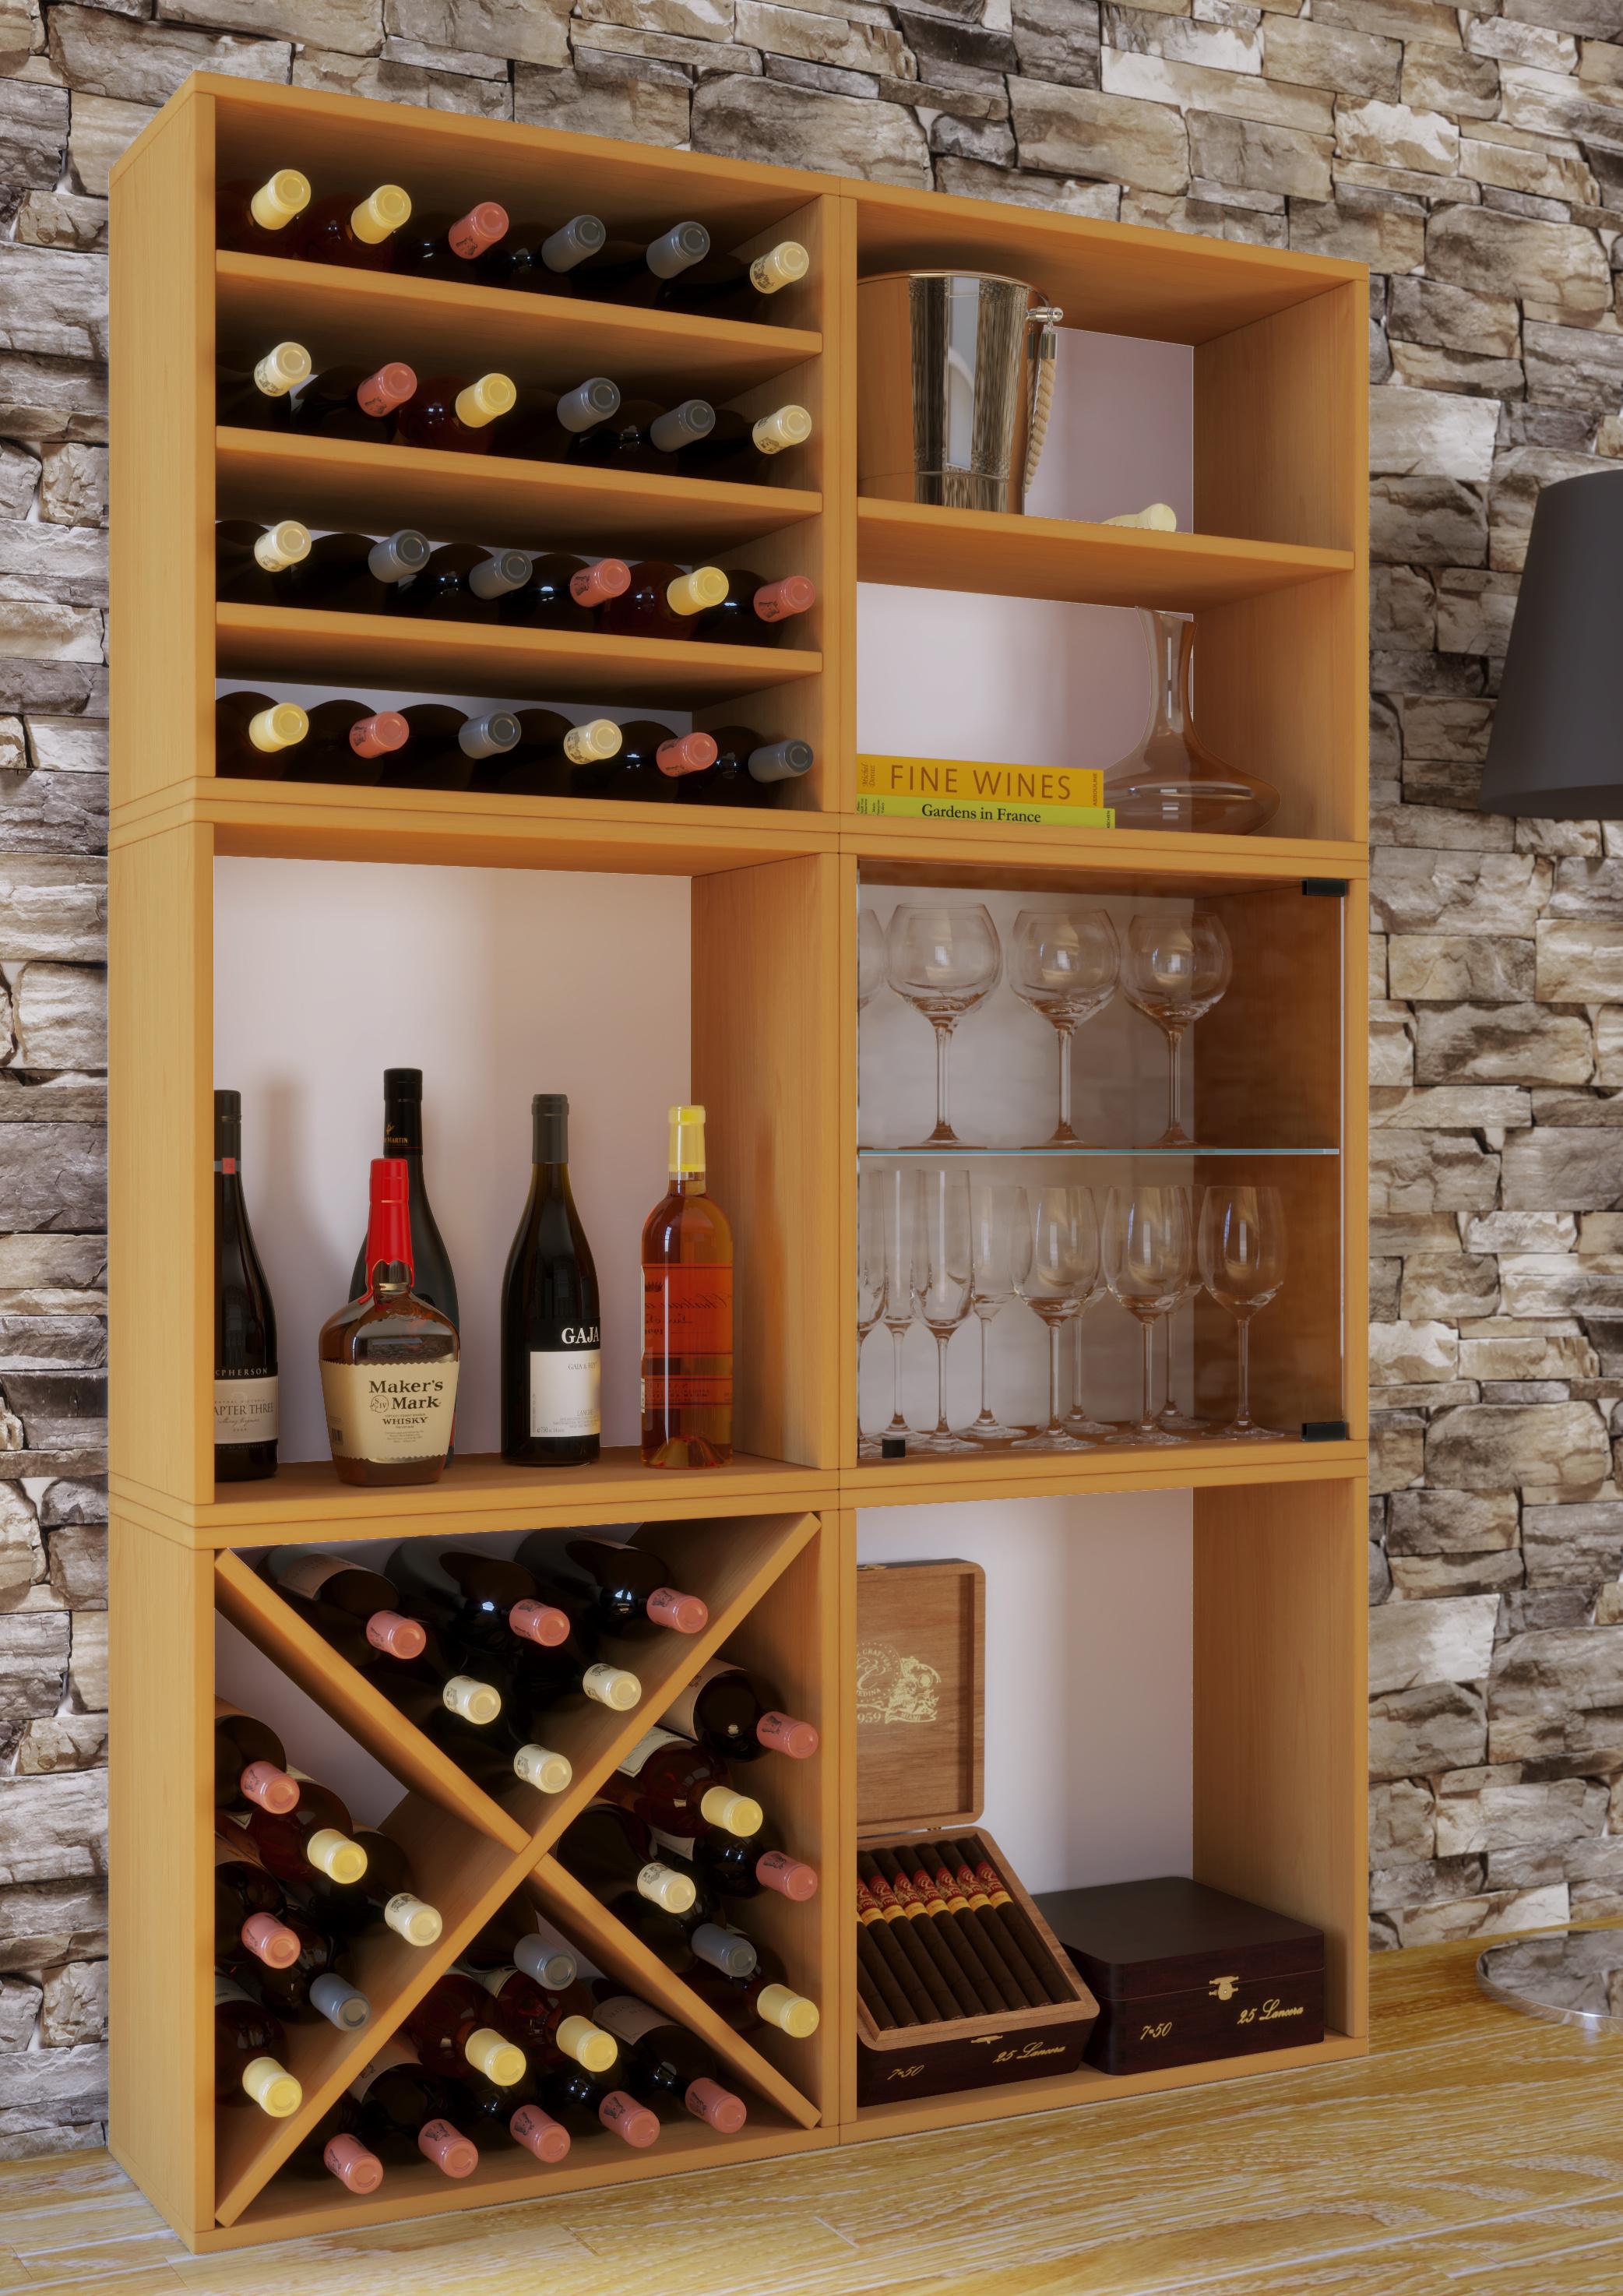 Vcm Wein Regalserie Regal Weinregal Weinschrank Weinflaschen Schrank Holz Wurfel Flaschen Aufbewahrung Weino Vcm Weinregal Serie Weino Farbe Weino V Buche Weltbild De